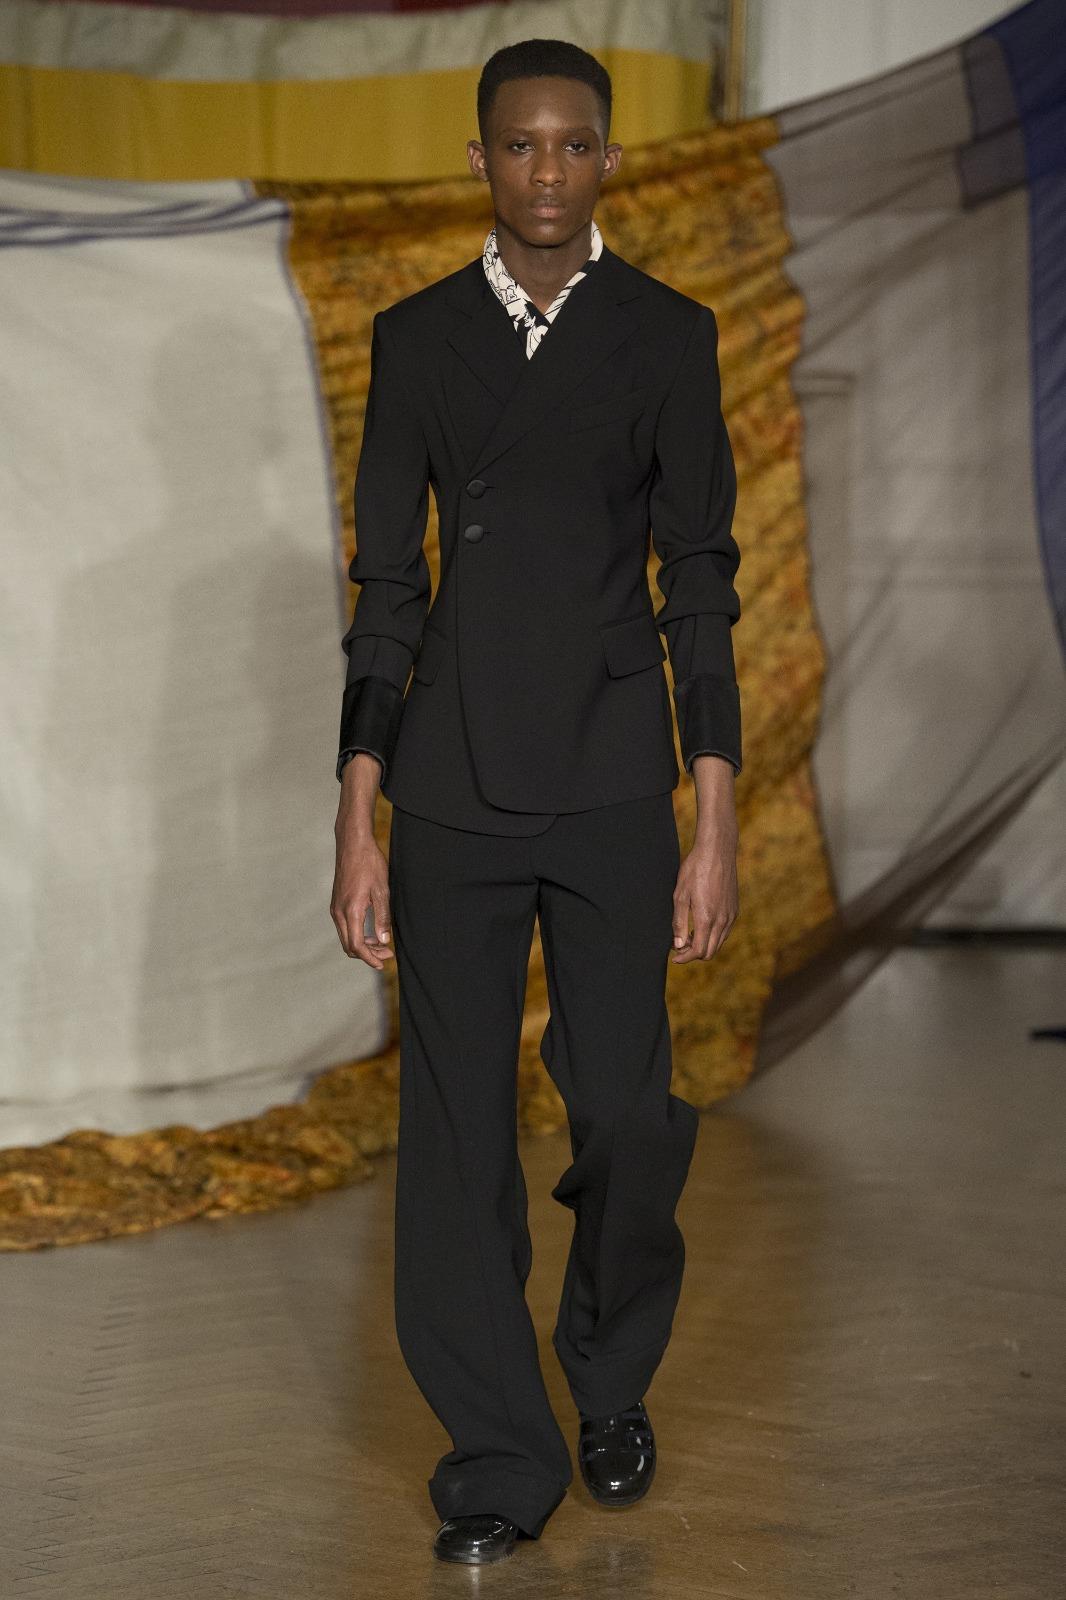 访谈系列:男装设计师Grace Wales Bonner